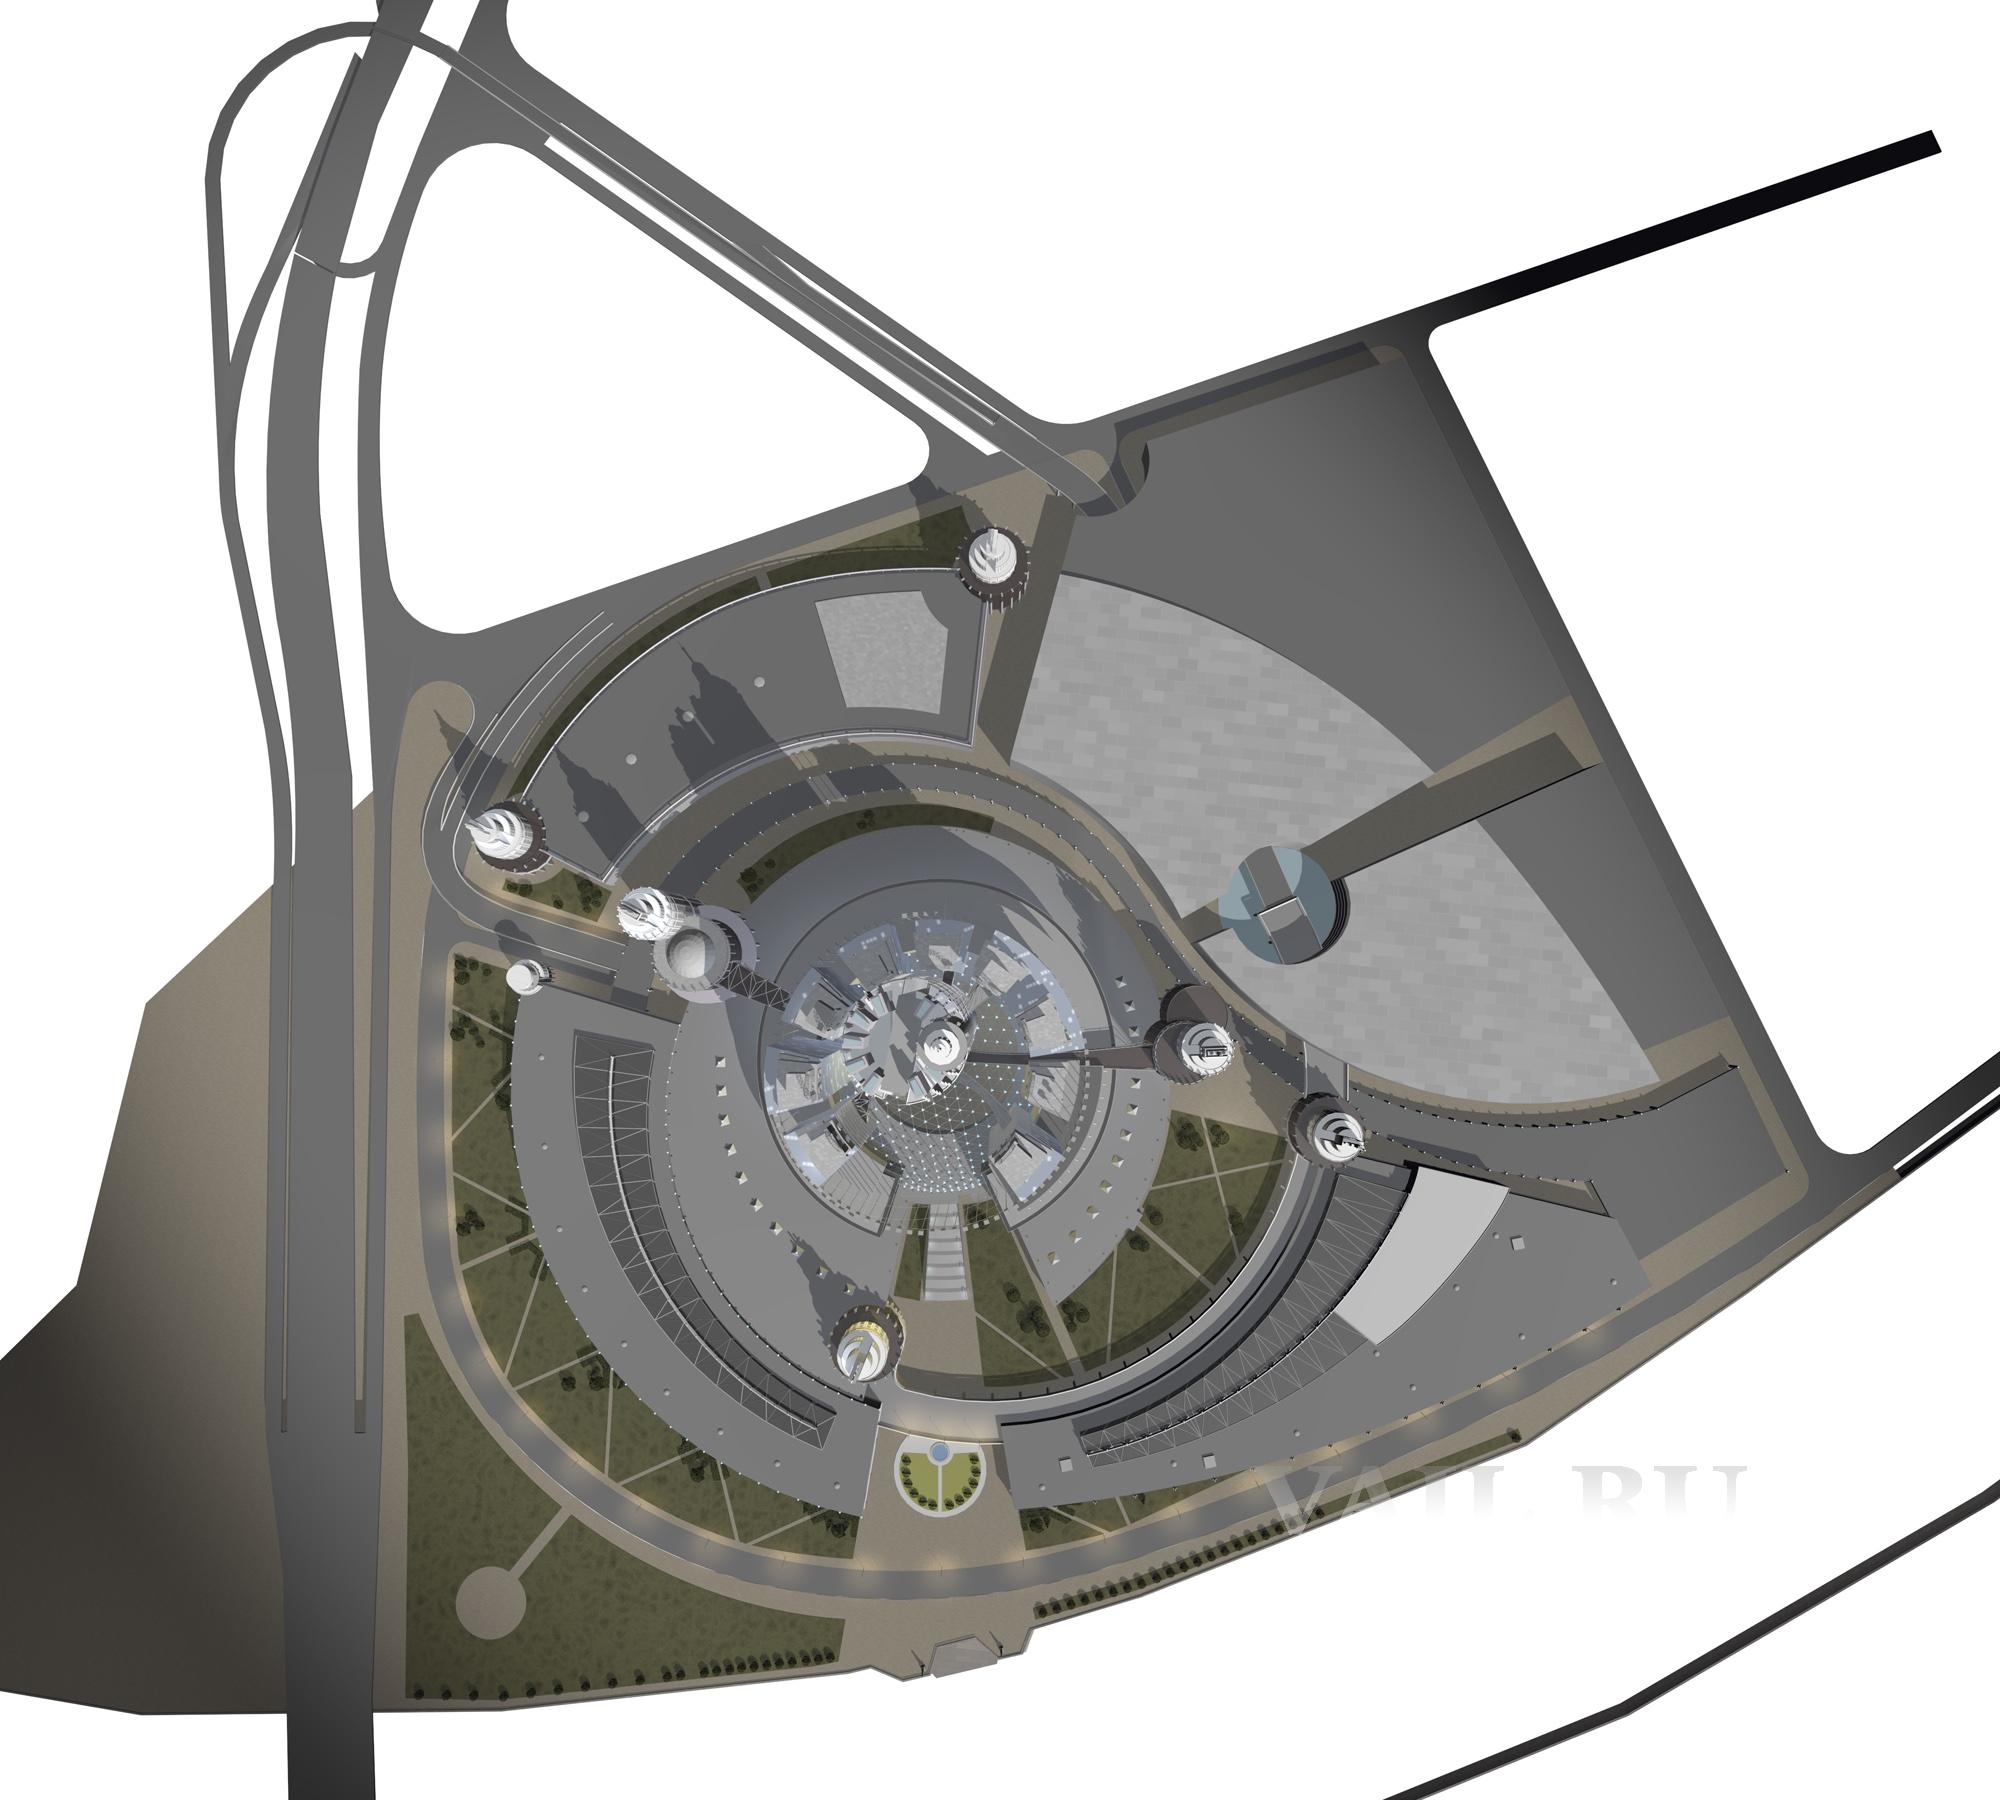 Проект генплана Делового центра для МО. 2010 г.